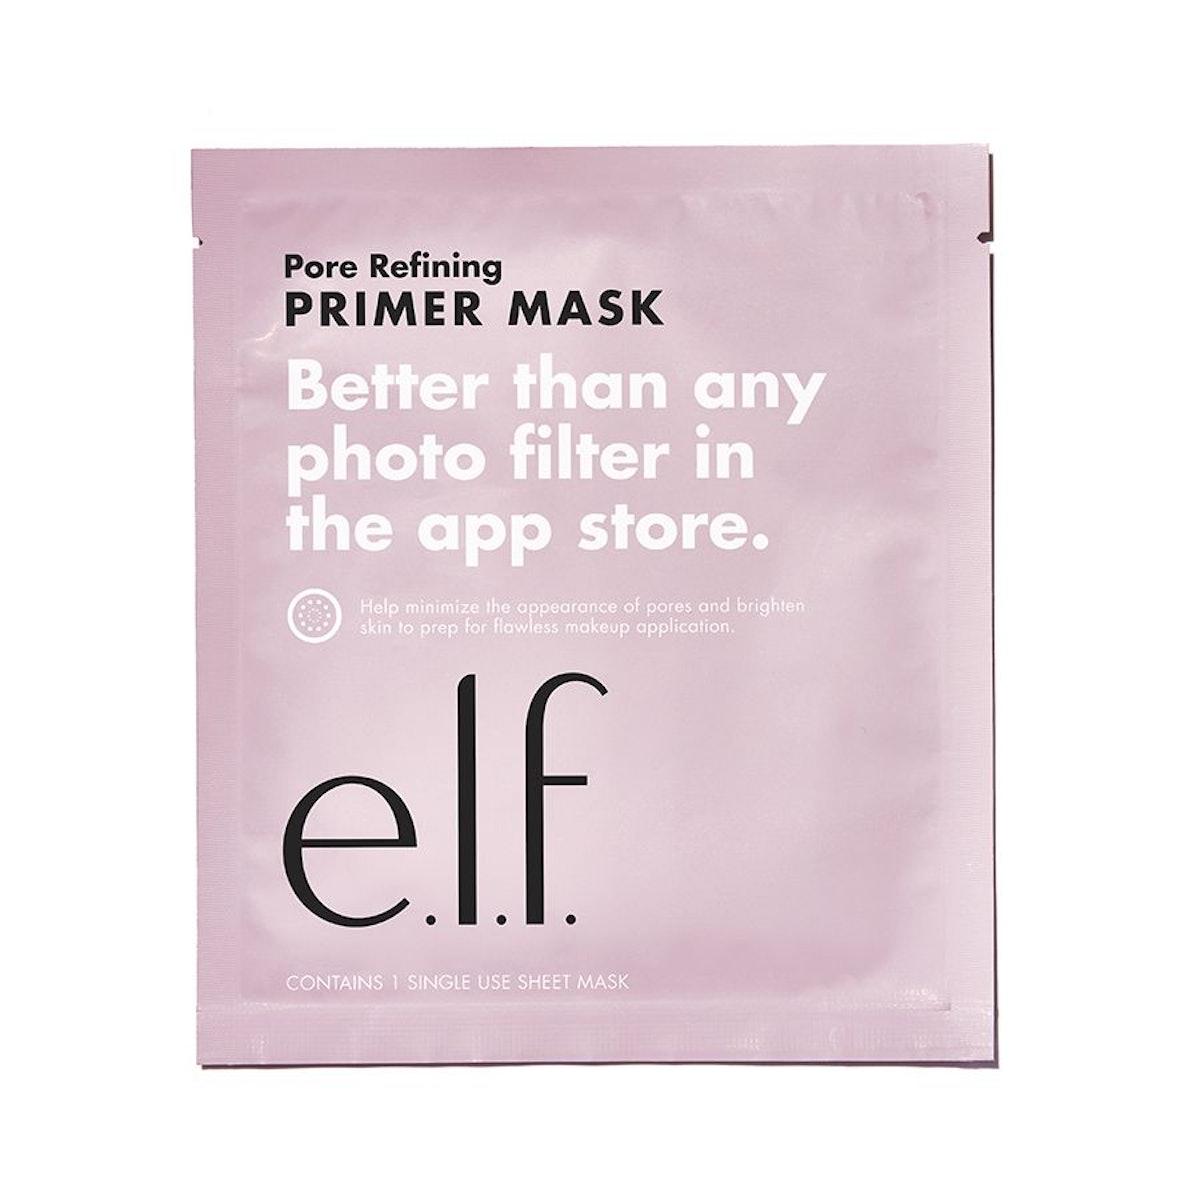 Pore Refining Primer Mask